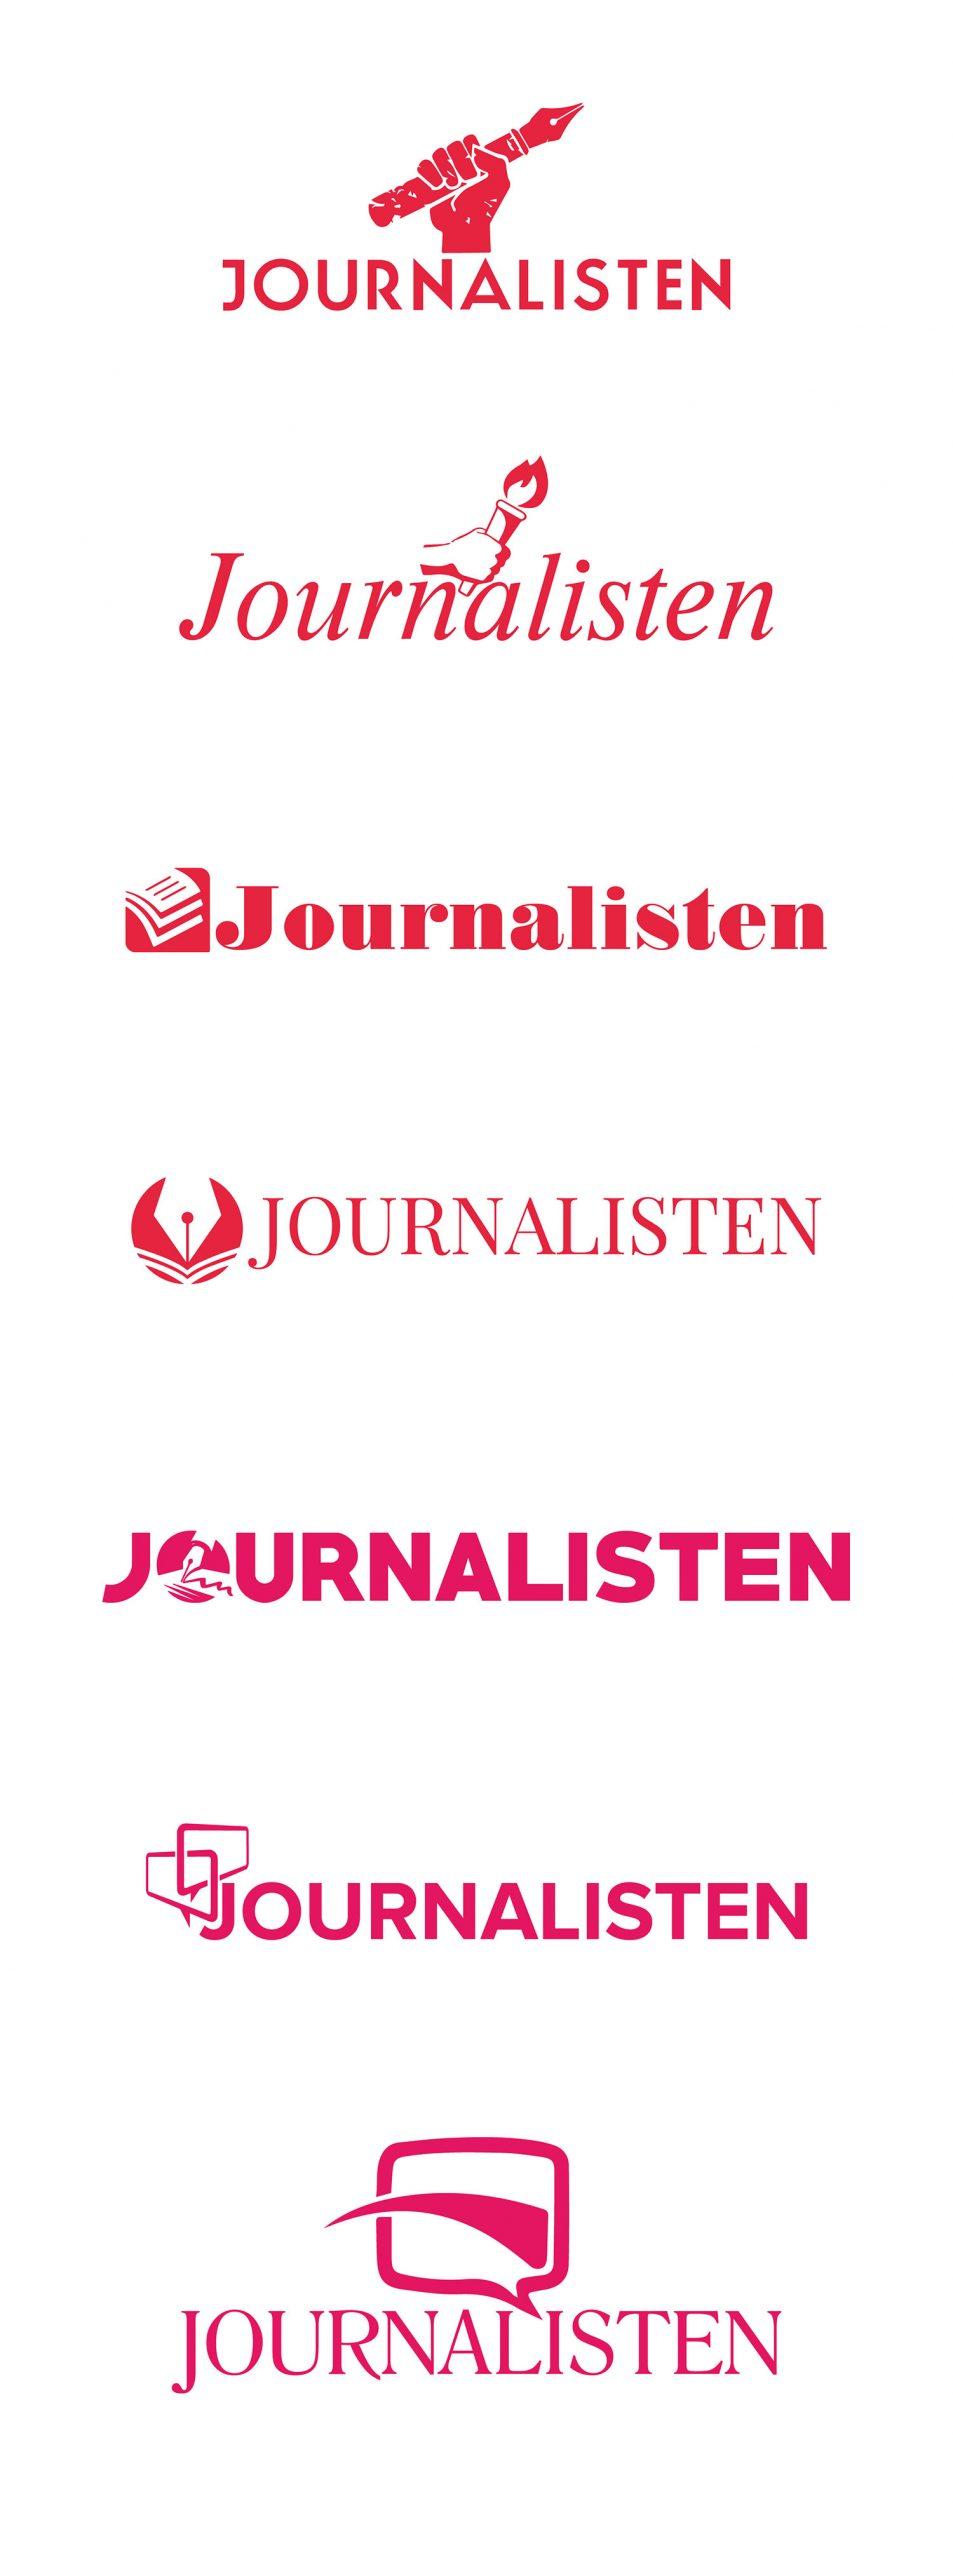 Journalistens logo redesignet på tre kontinenter – her er resultaterne 4